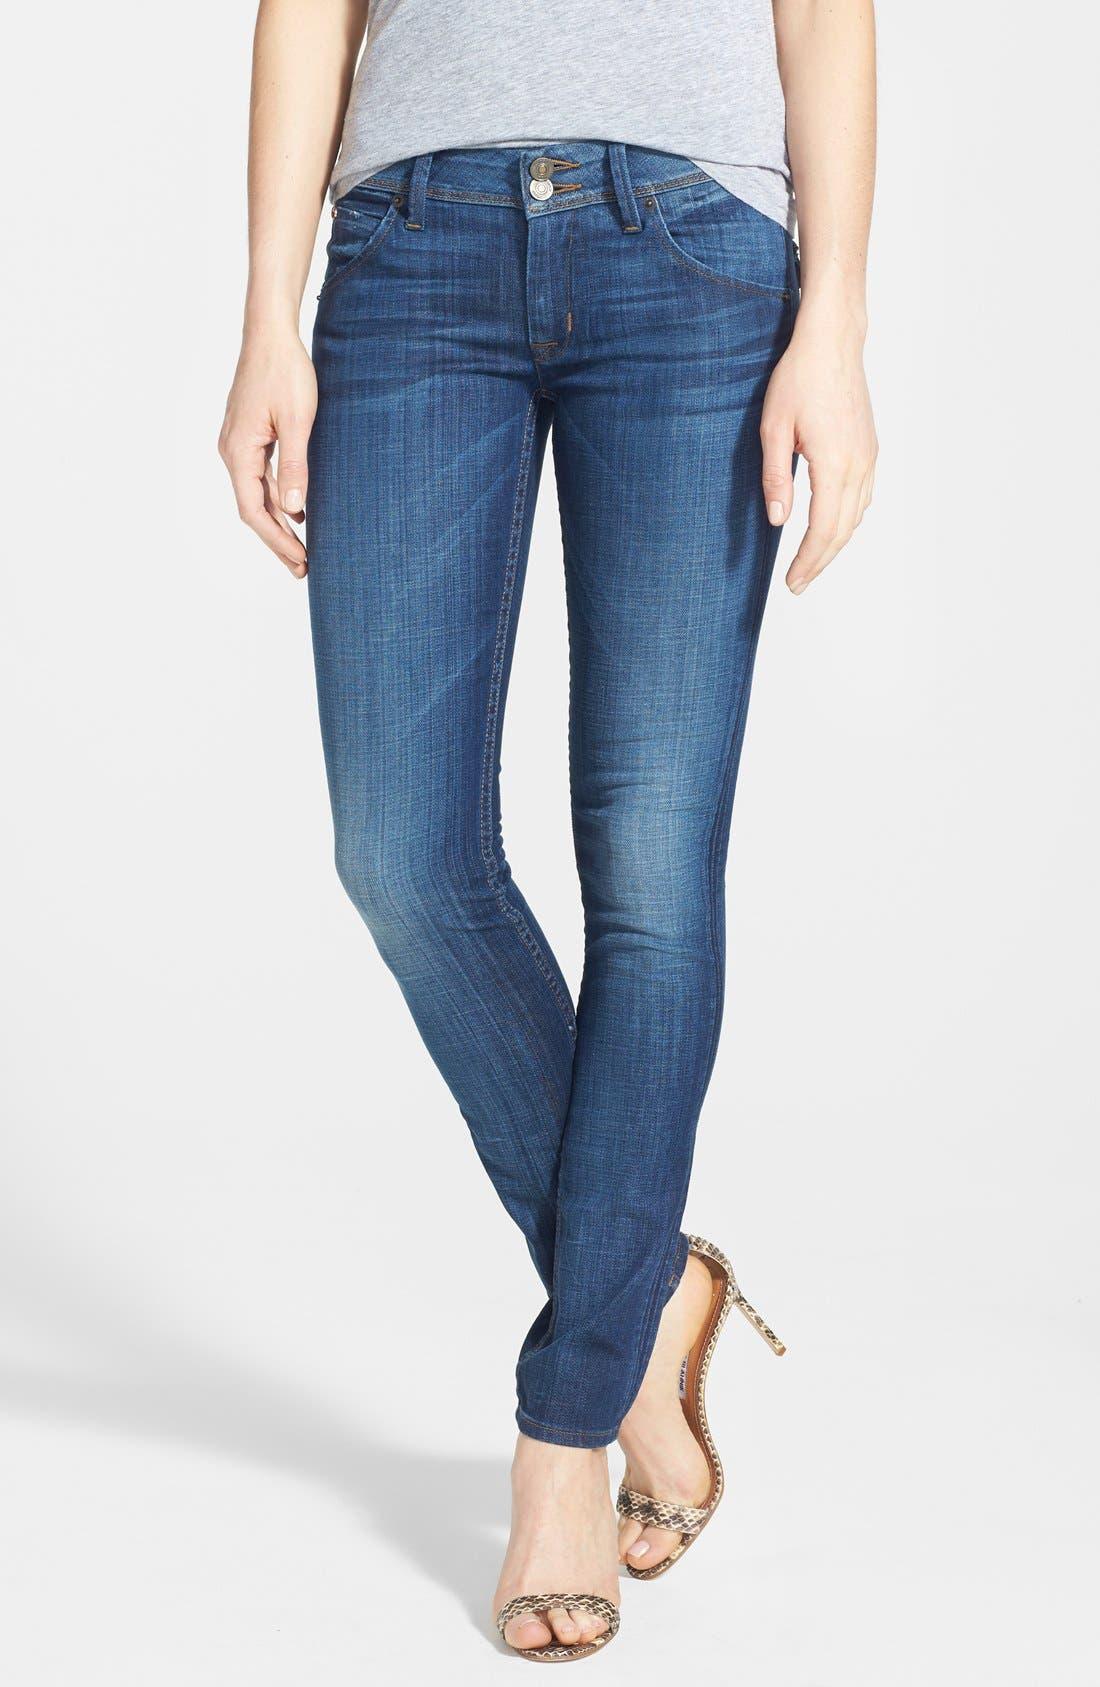 Alternate Image 1 Selected - Hudson Jeans 'Collin' Skinny Jeans (Saville)